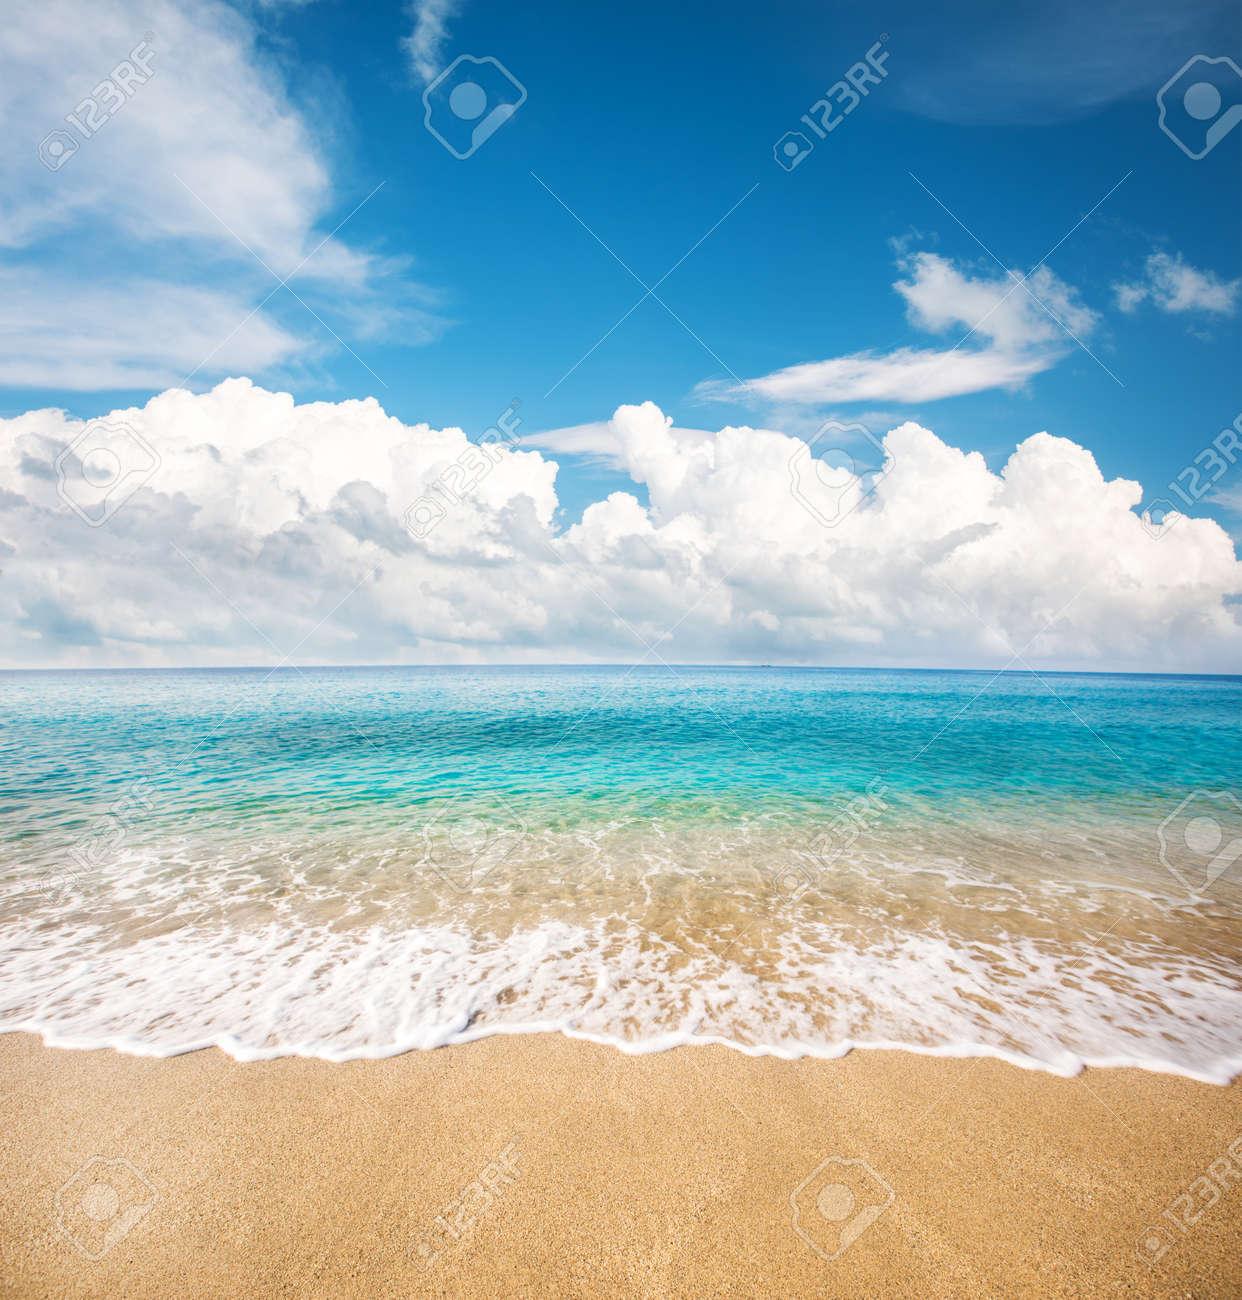 beautiful beach and tropical sea - 147113034